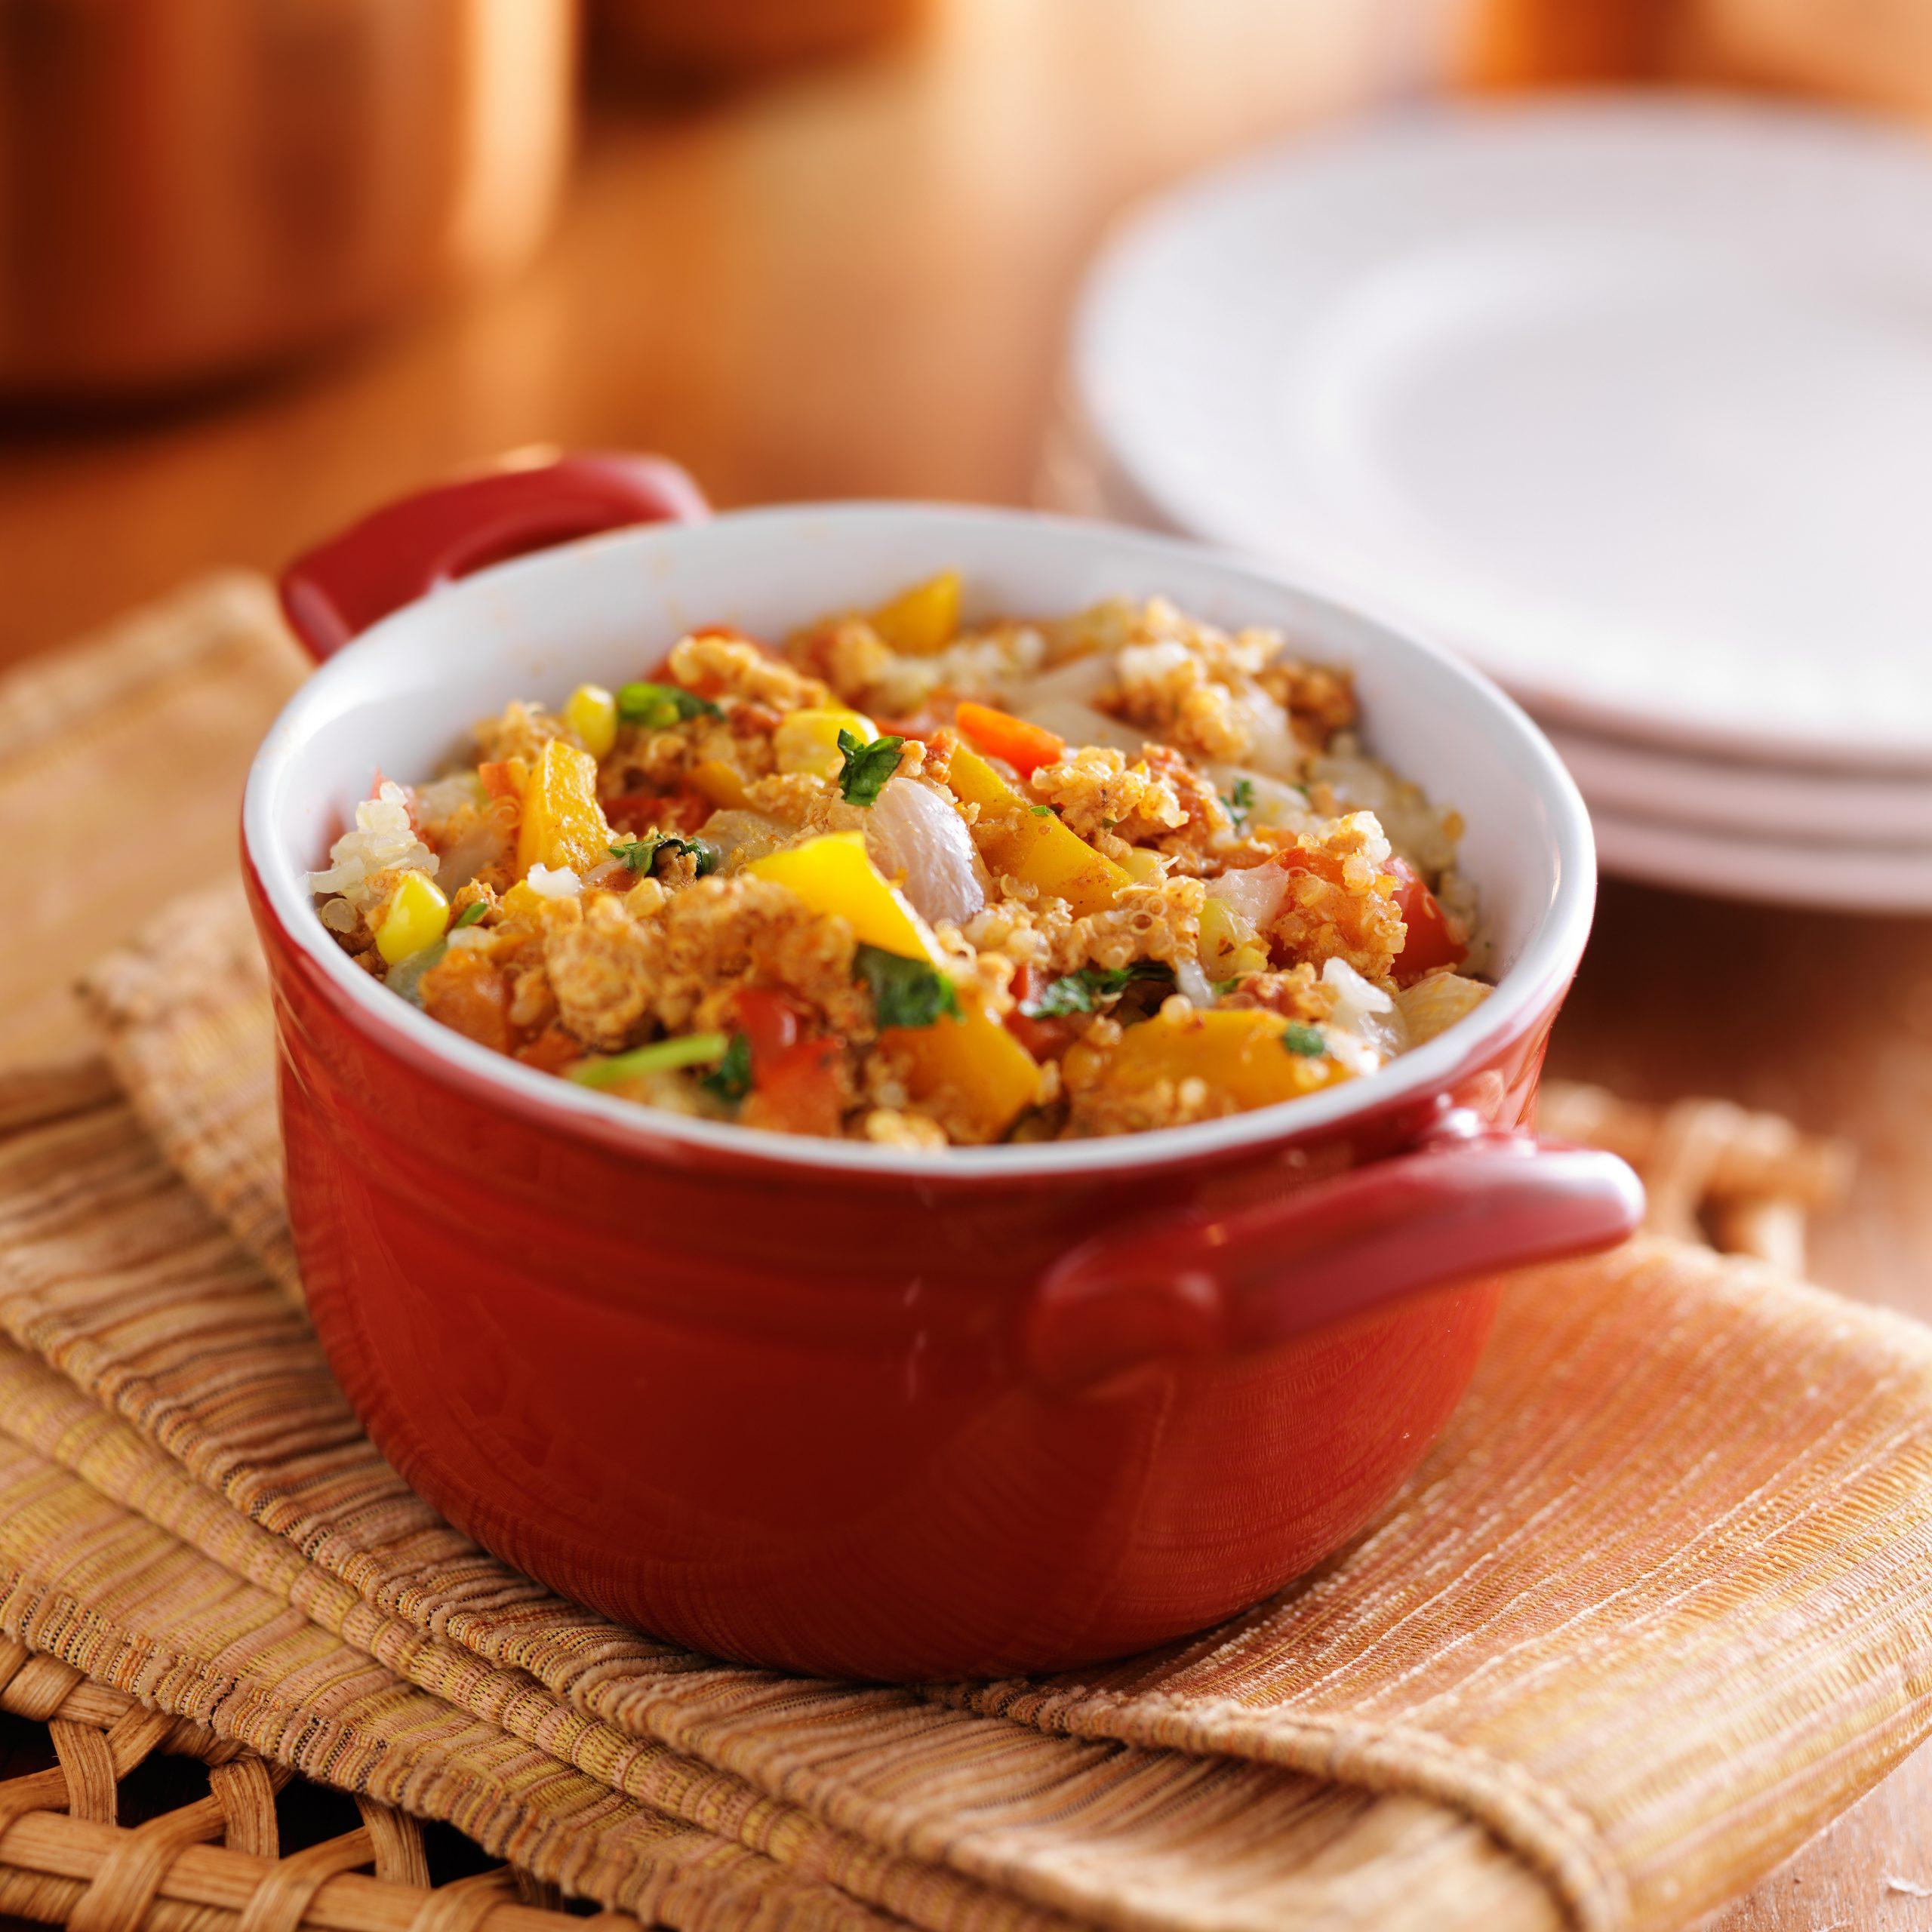 [RECIPE] Truly tempting Tex-Mex millet and amaranth corn casserole